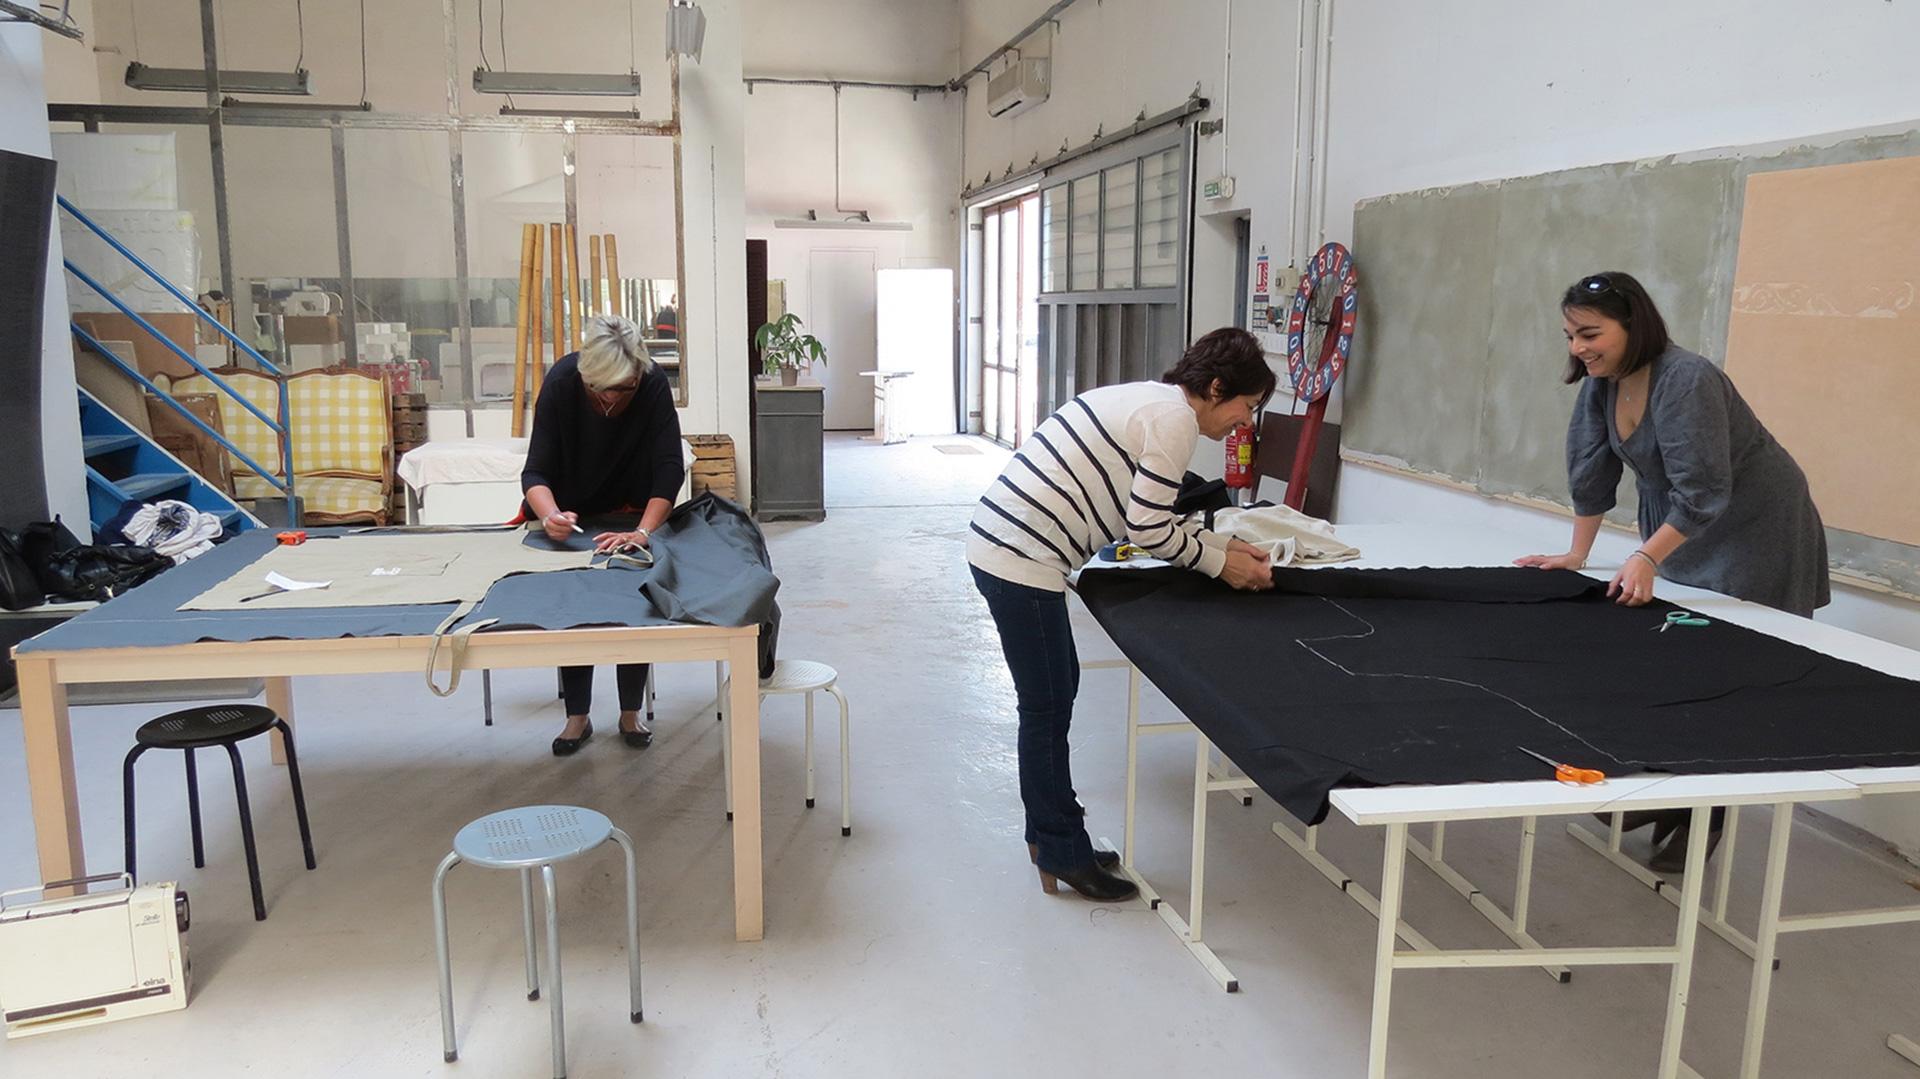 atelier diy 2 atelier brut de d co. Black Bedroom Furniture Sets. Home Design Ideas